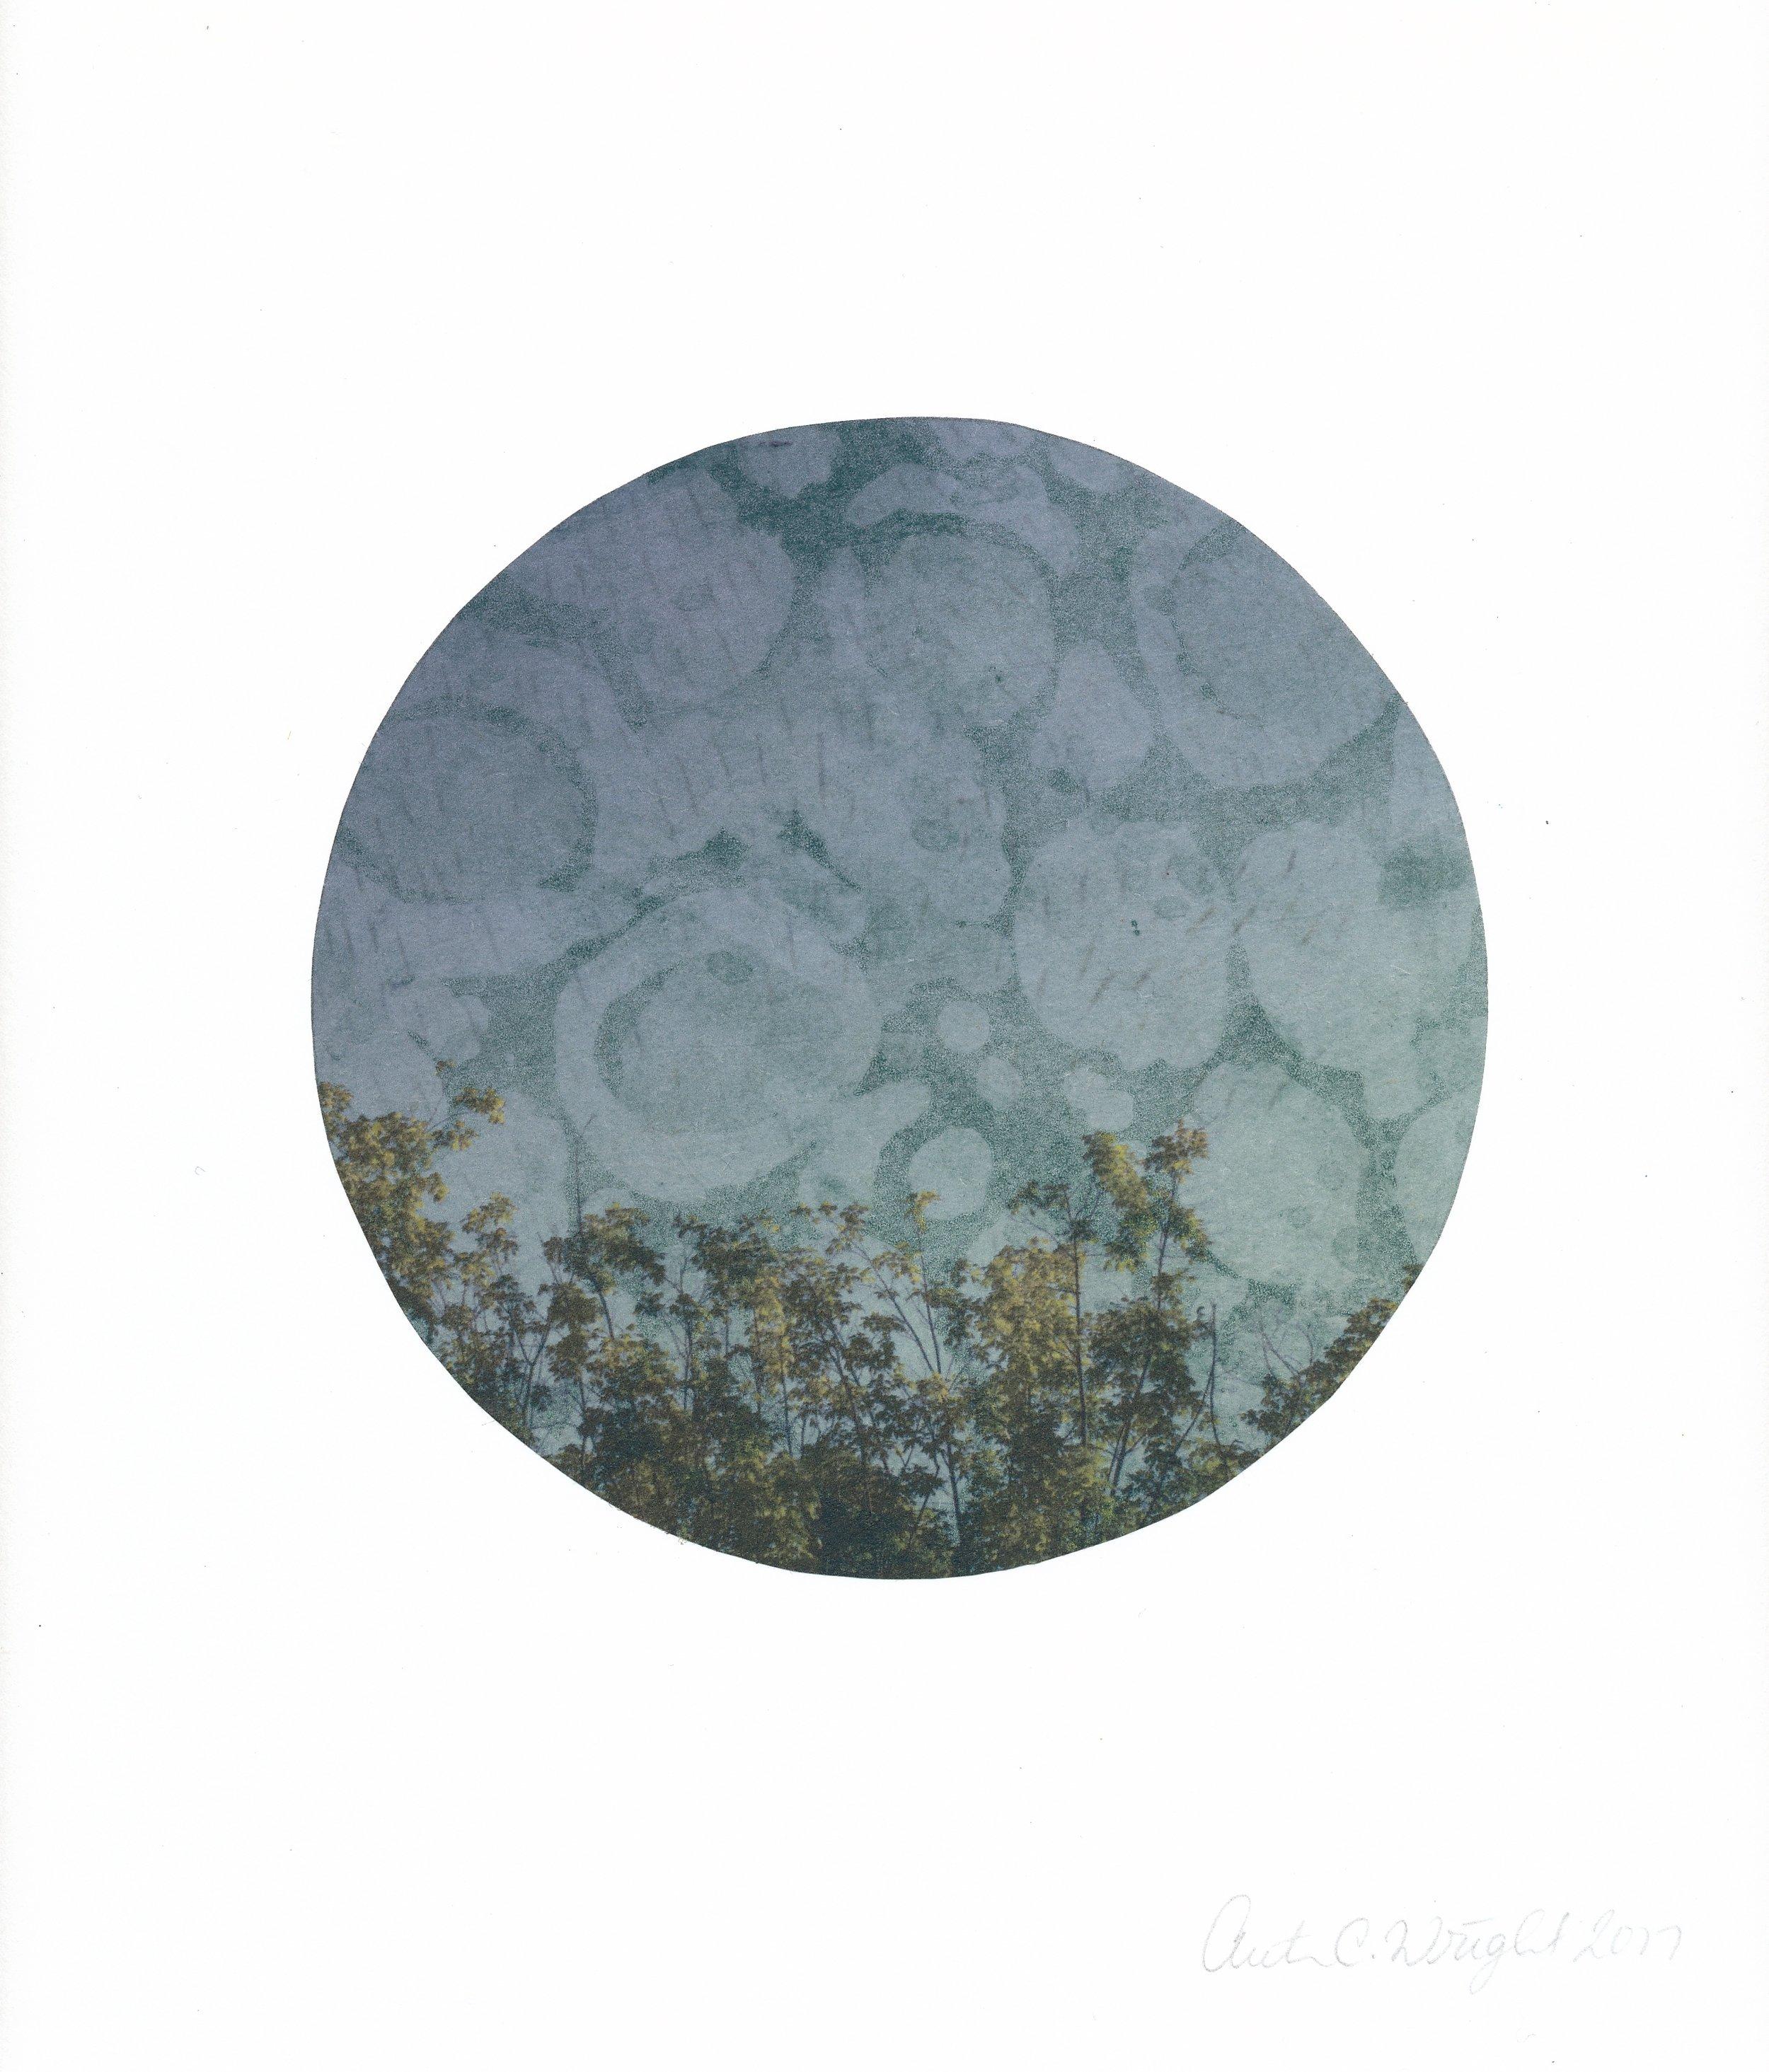 circle181.jpg